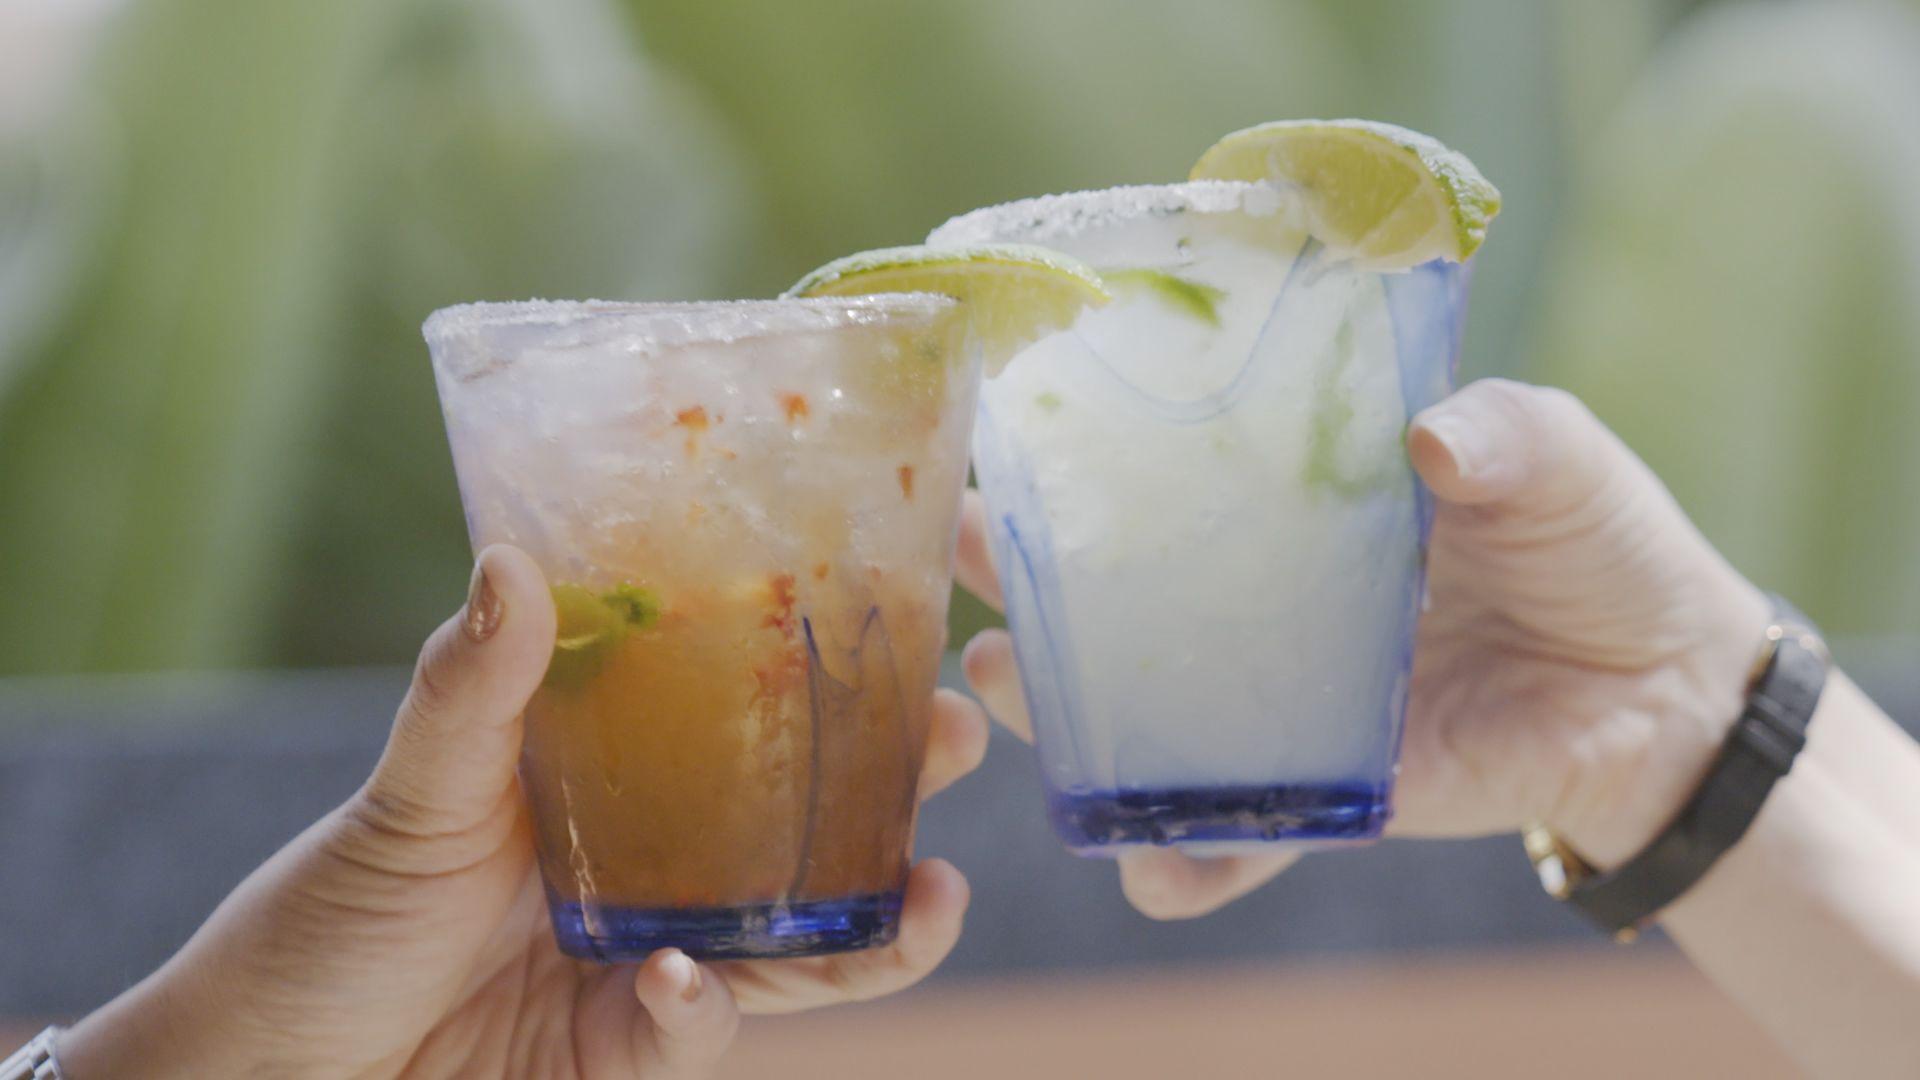 This Disneyland Restaurant Serves 130 Types Of Tequila